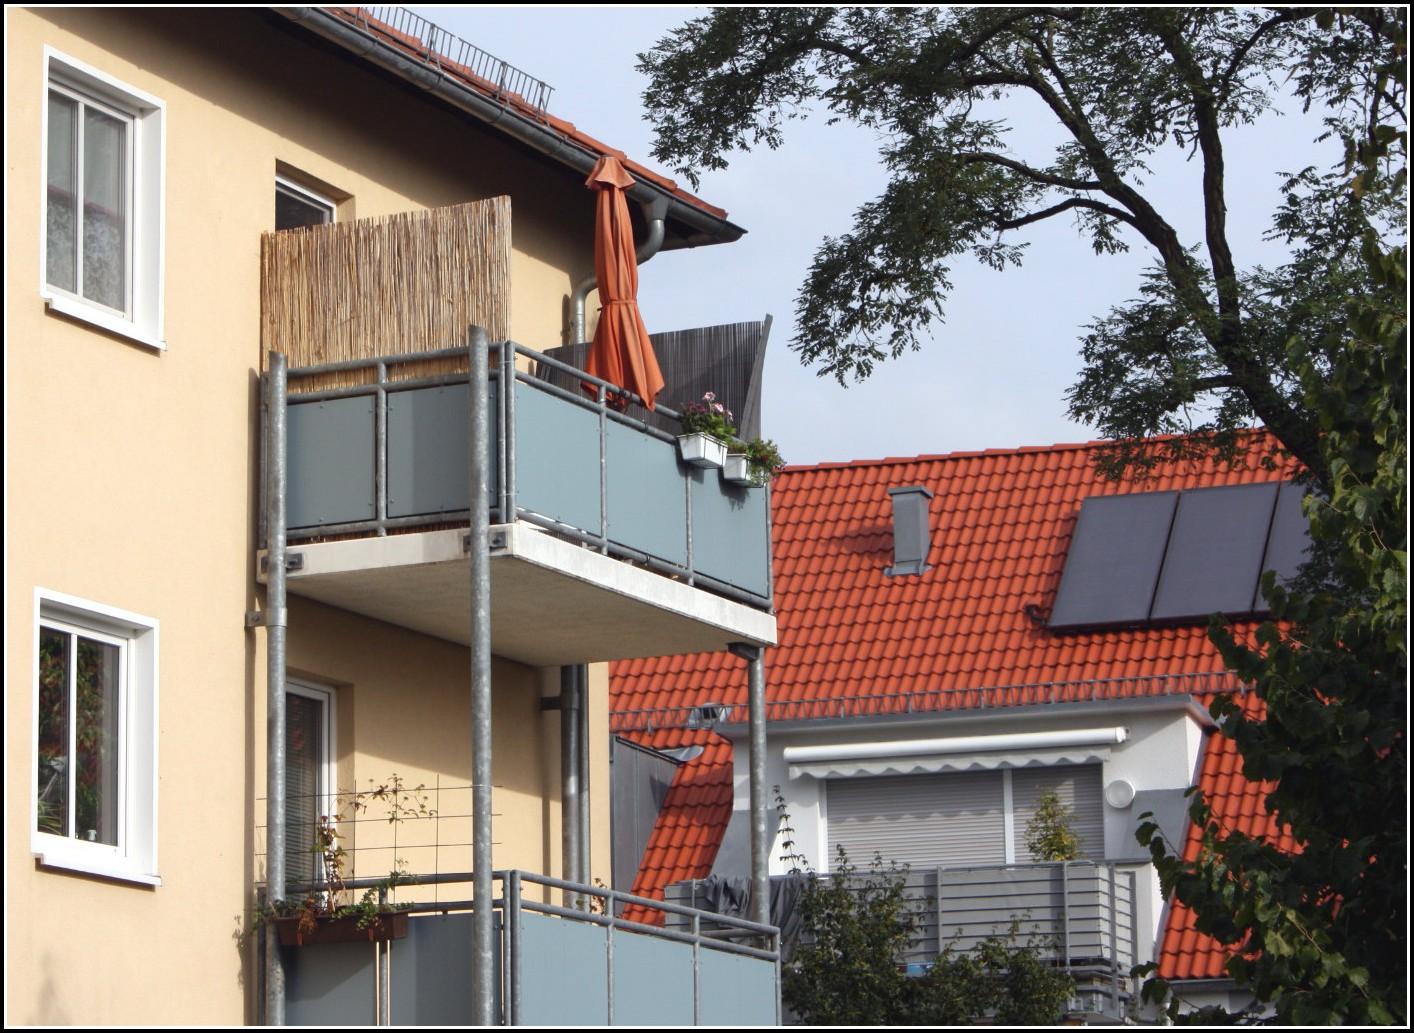 Seiten Sichtschutz Balkon Plexiglas Dolce Vizio Tiramisu